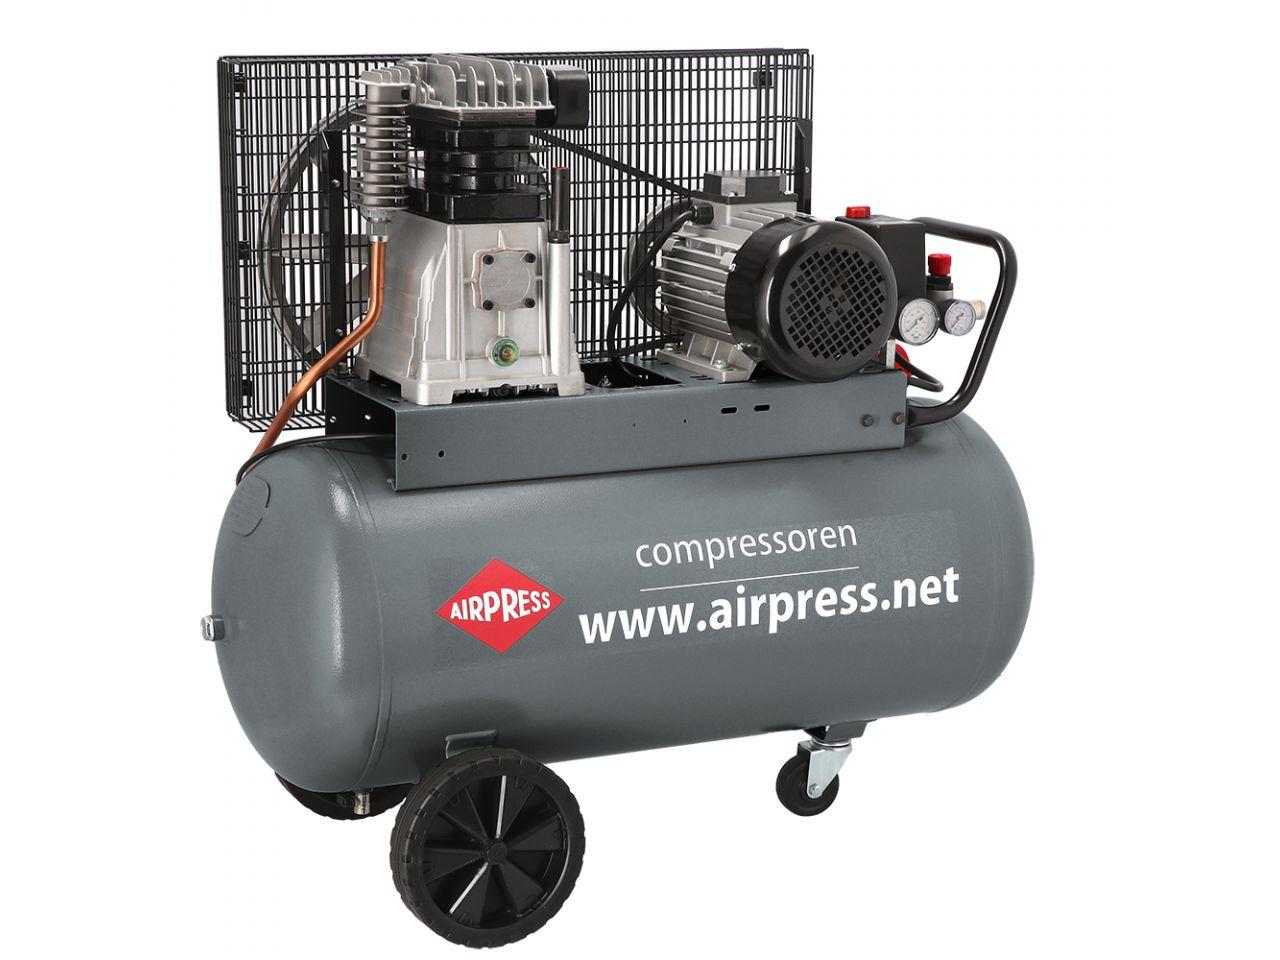 Airpress Kompressor HK 600-90